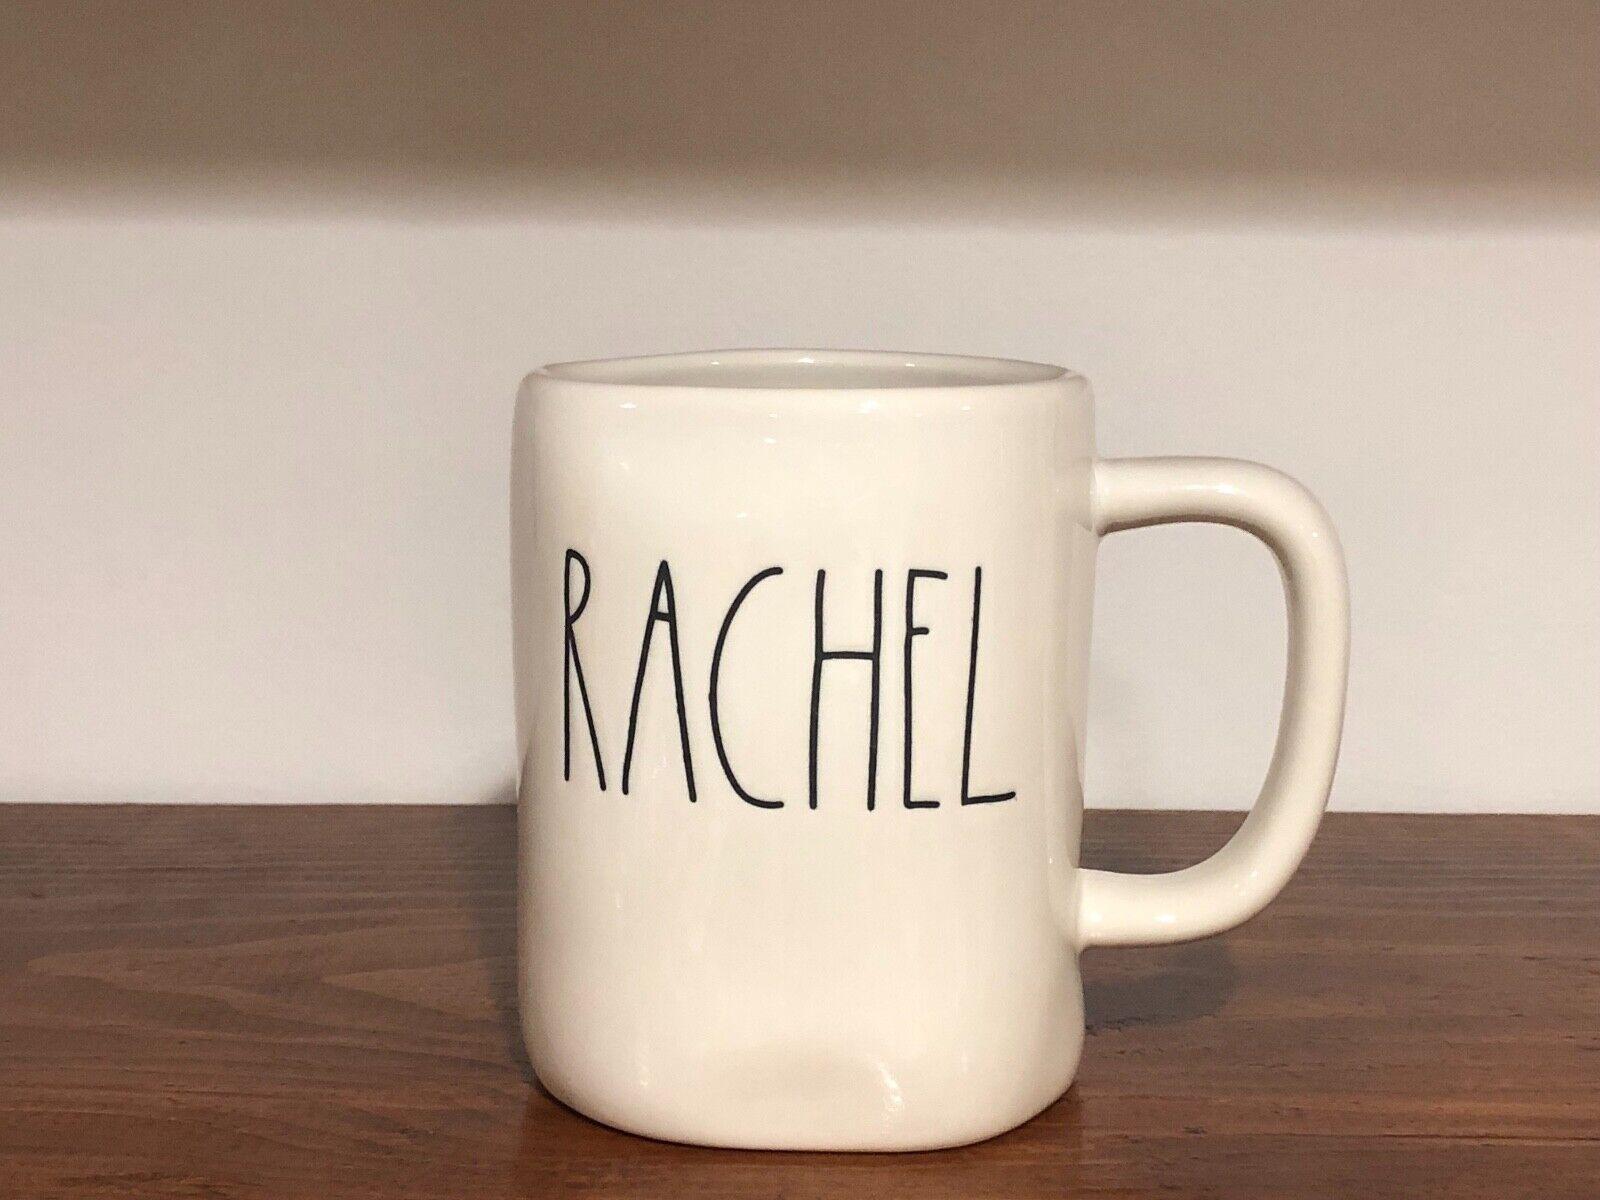 Rae Dunn Artisan Collection By Magenta Farmhouse LL Large Letter Coffee Tea Mug RACHEL